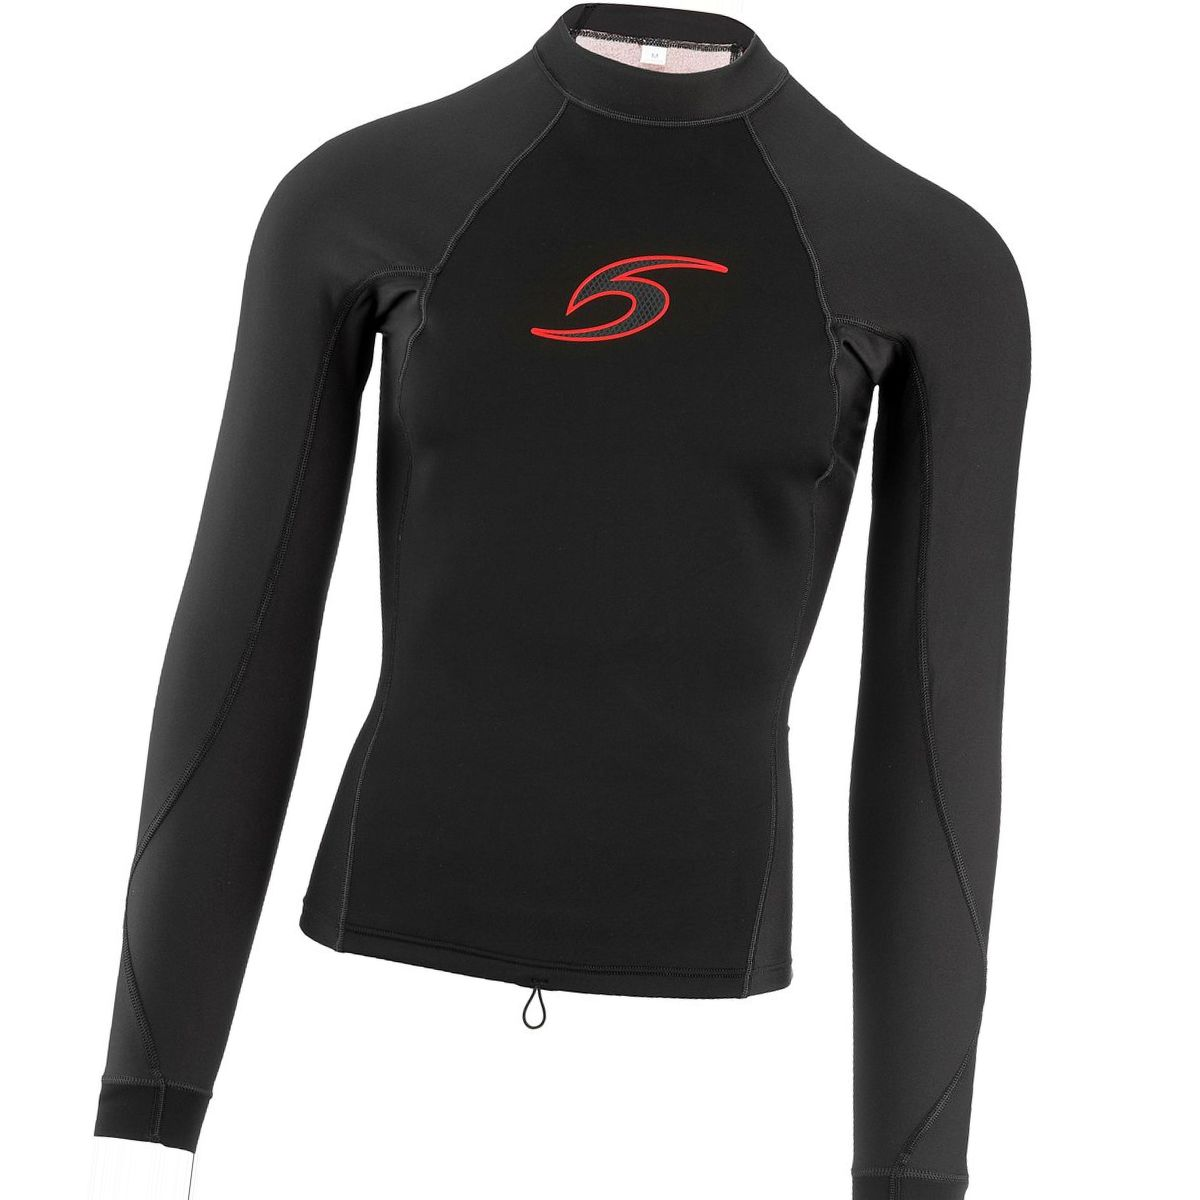 Rip Curl Flashbomb Hybrid Long-Sleeve Wetsuit Jacket - Men's